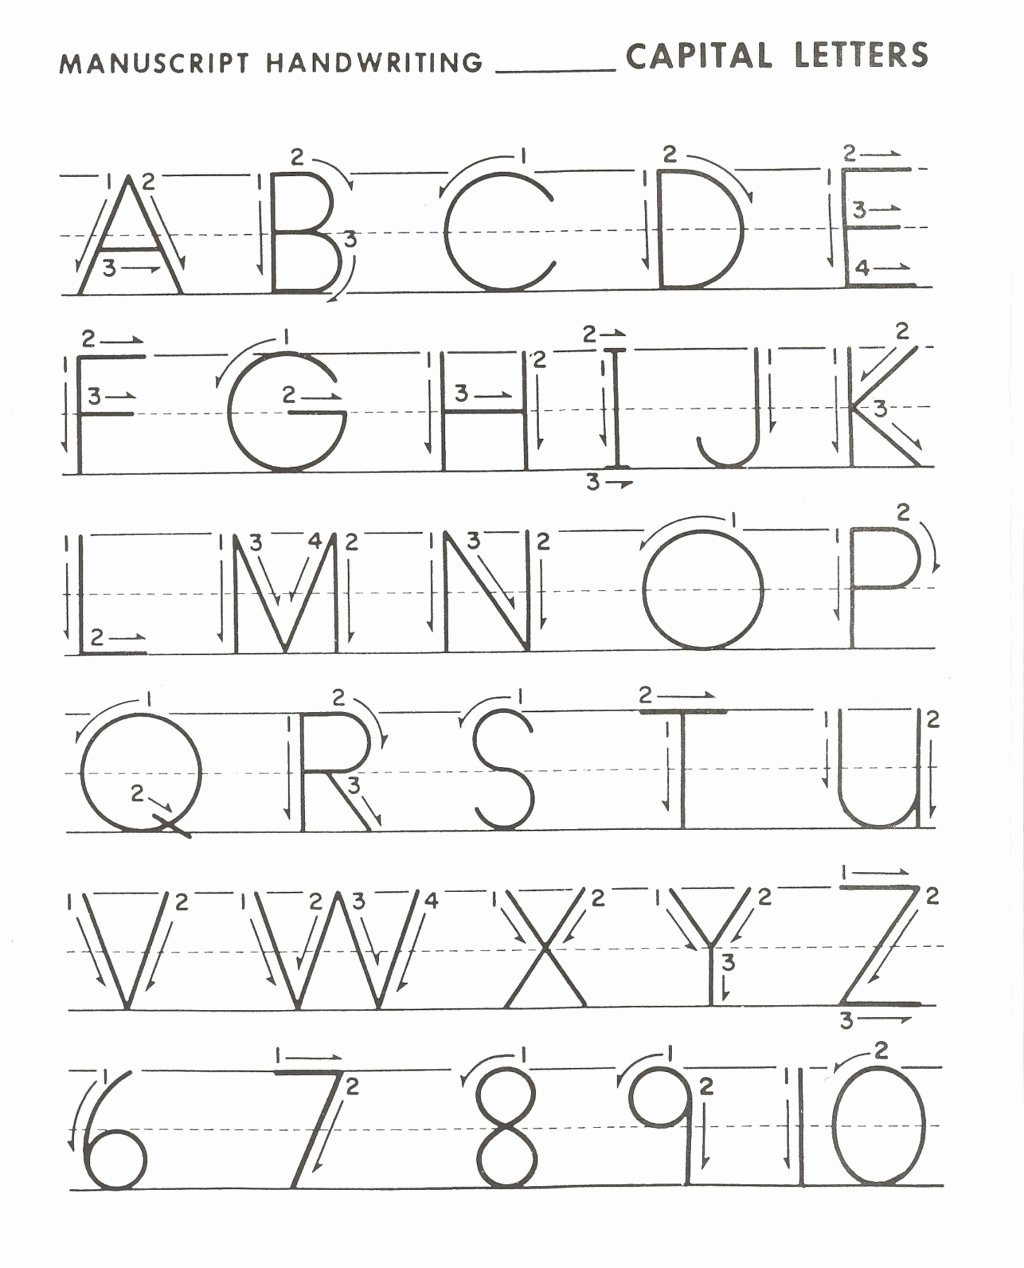 Capital Letters Worksheets for Preschoolers top Worksheet Remarkable Practice Writing Letters Worksheet